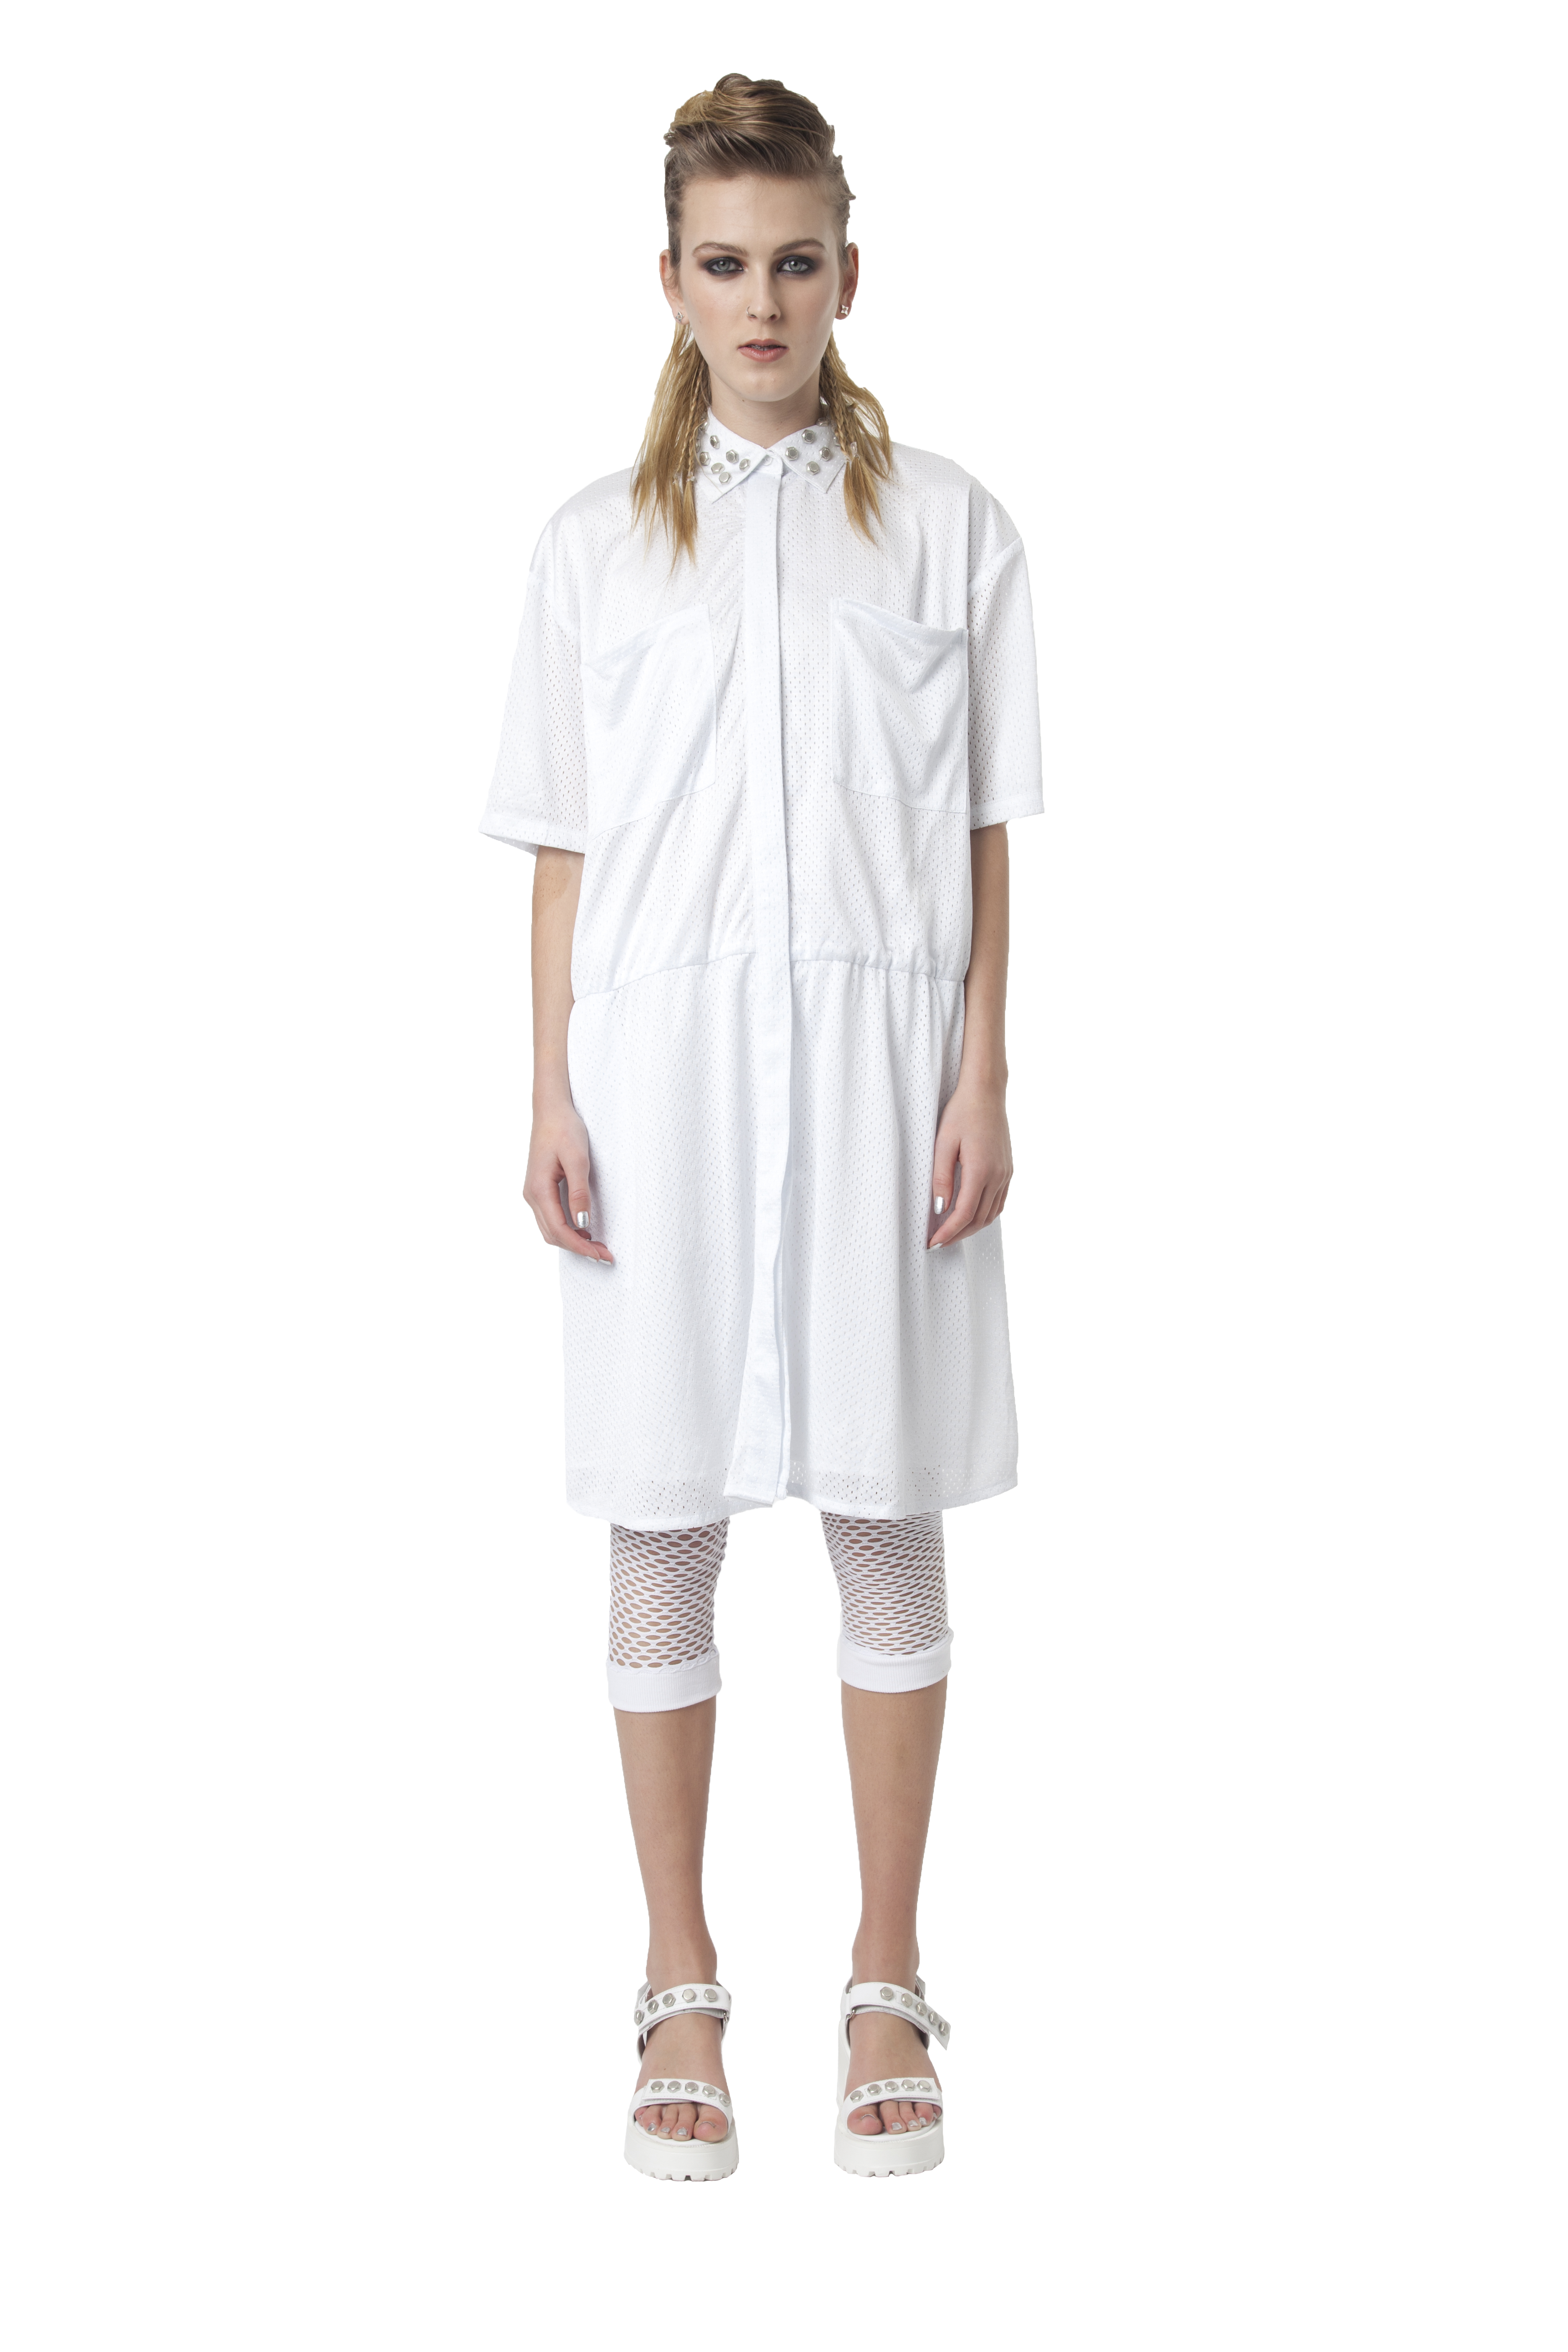 4.R13 HOLY SHIRT DRESS - WHITE-RRP$300